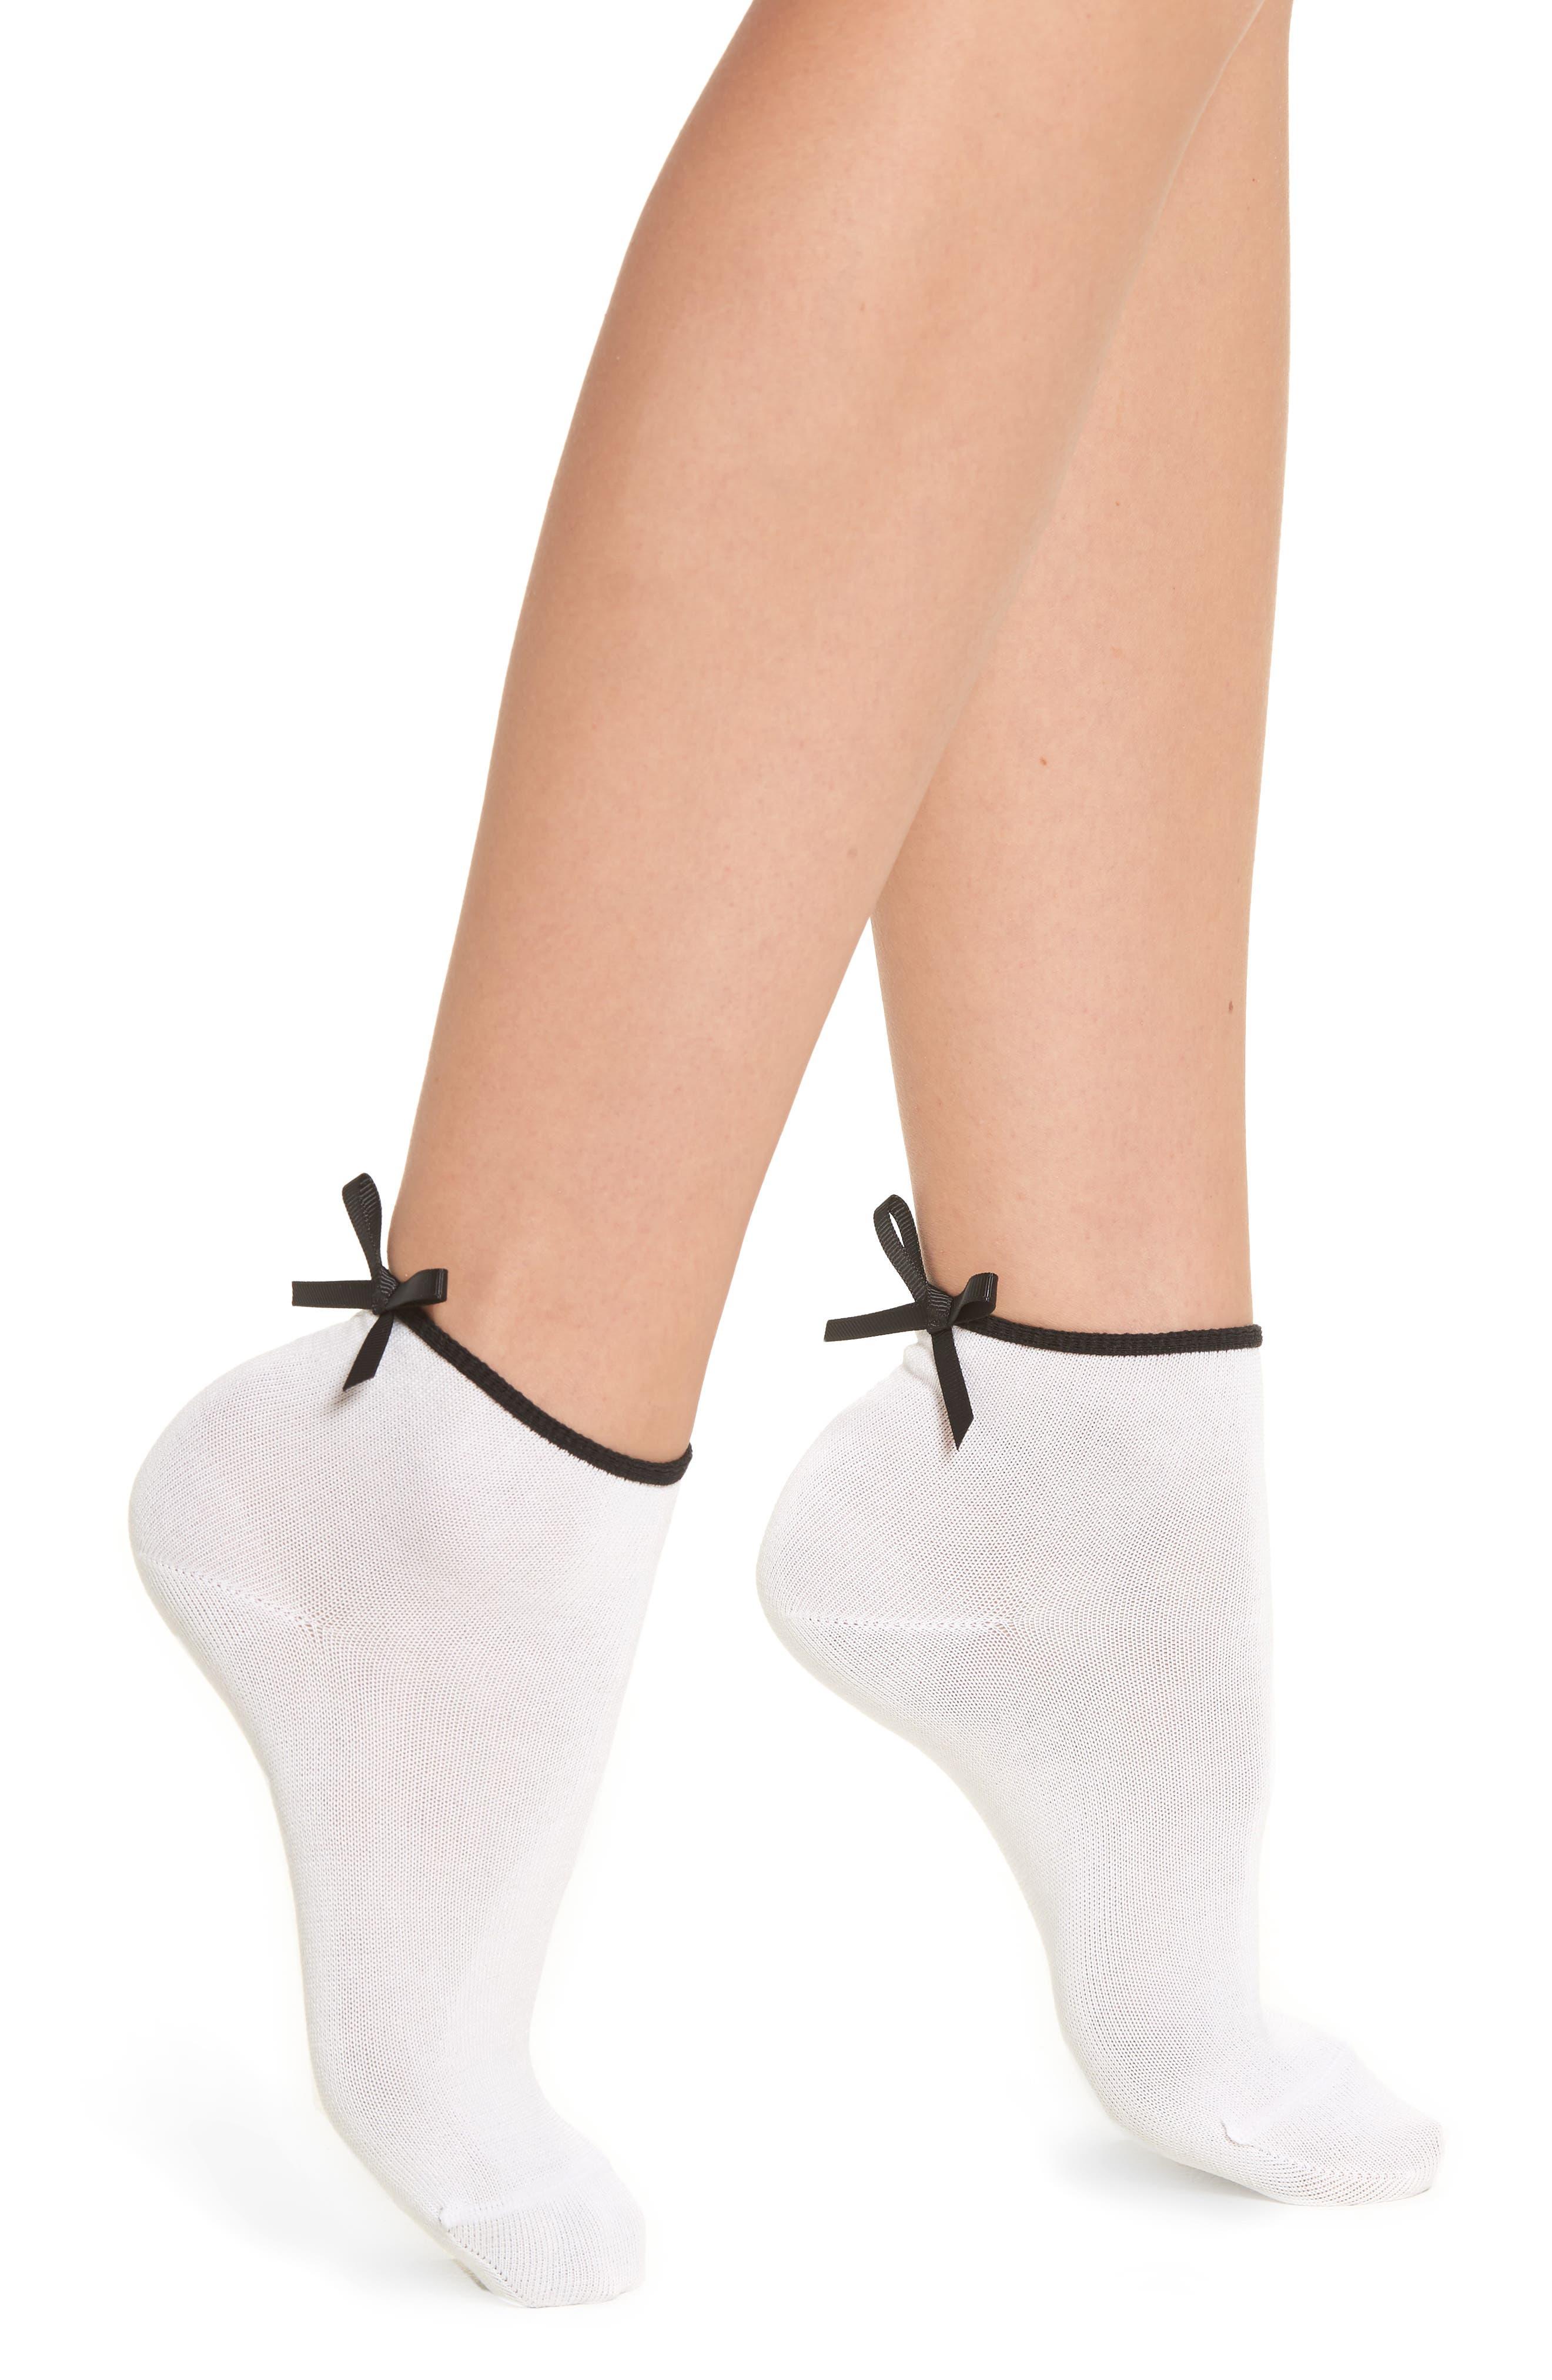 Main Image - Chelsea28 Bow Back Ankle Socks